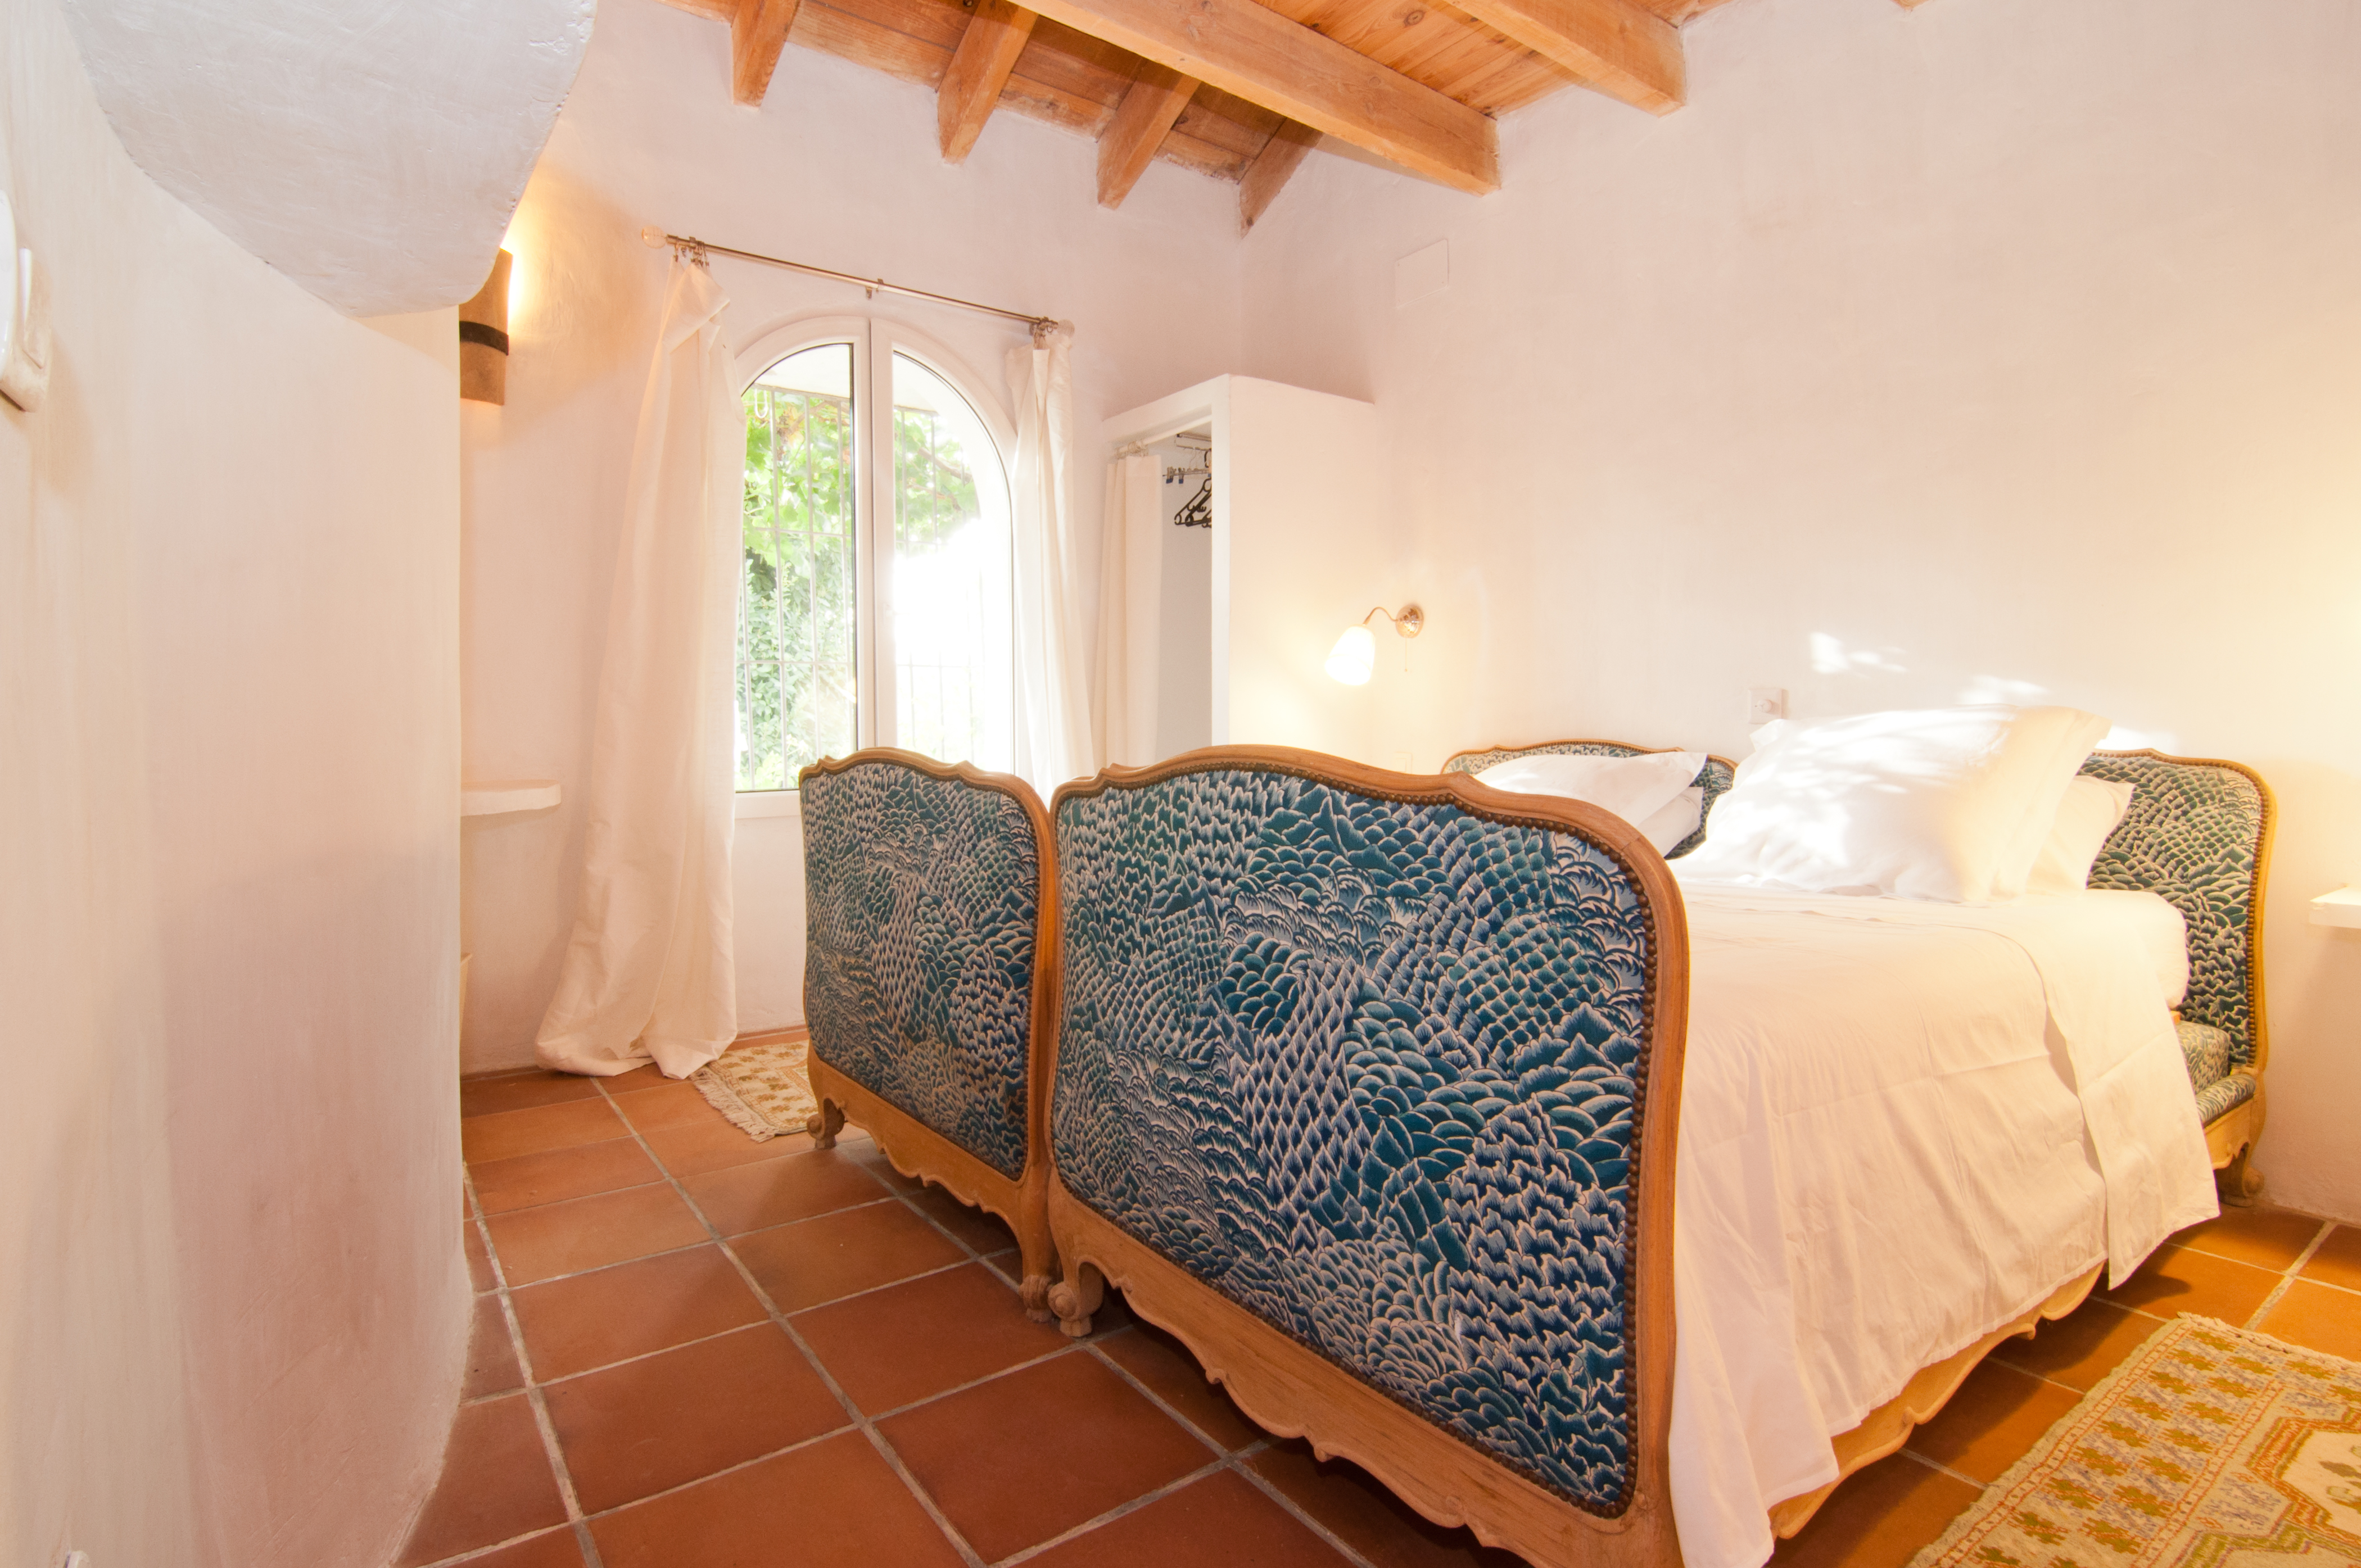 Garcia Lorca room